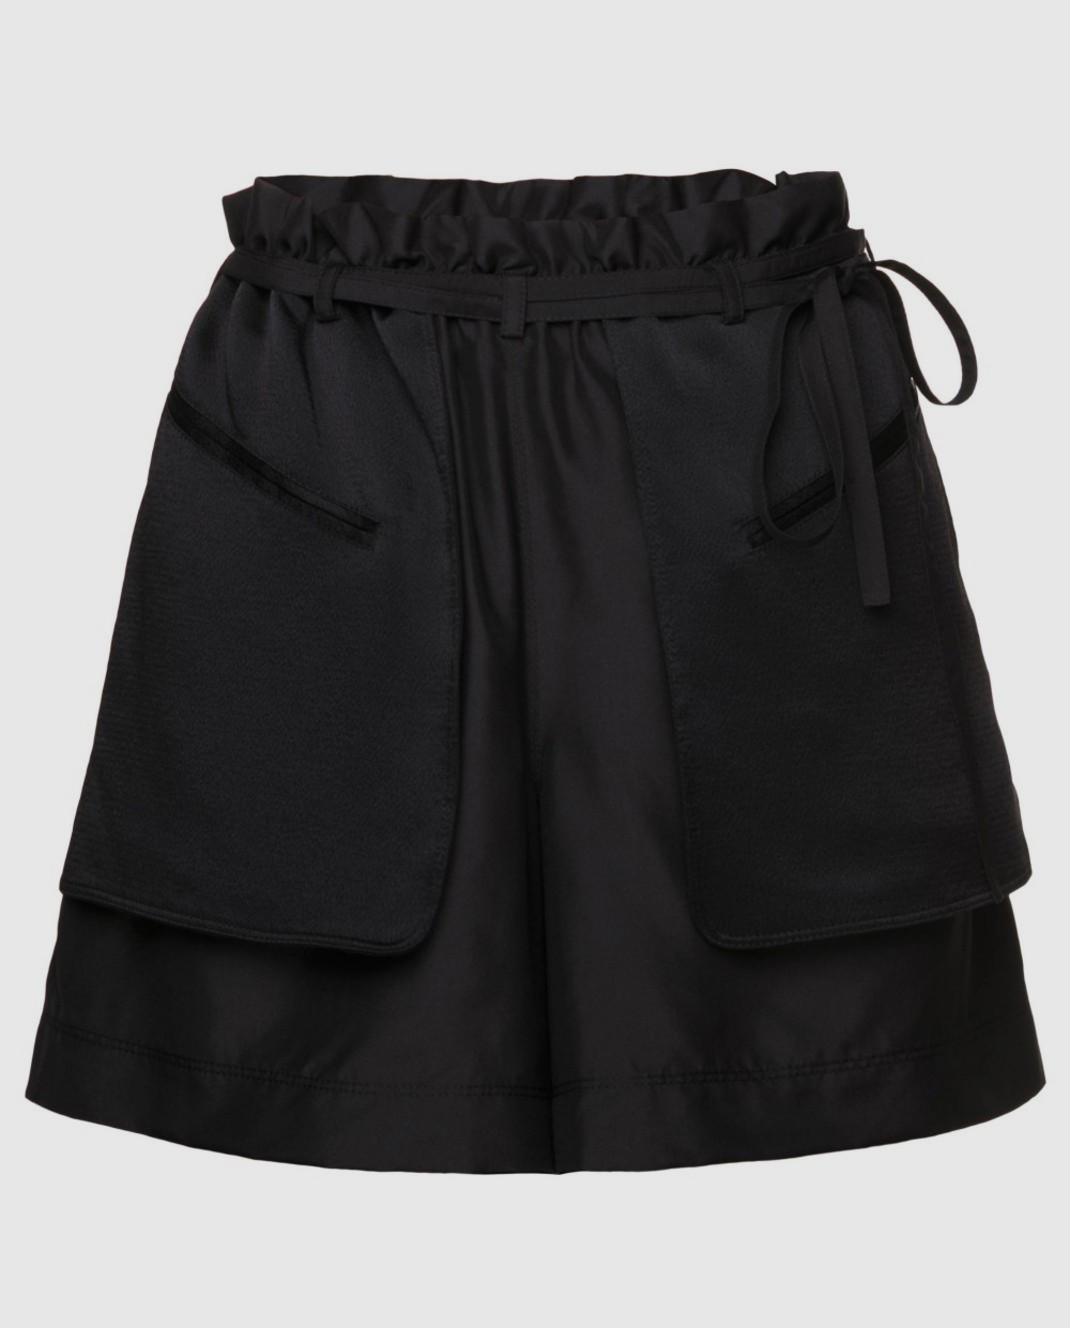 Valentino Черные шорты из шелка и хлопка PB0RF0N637C